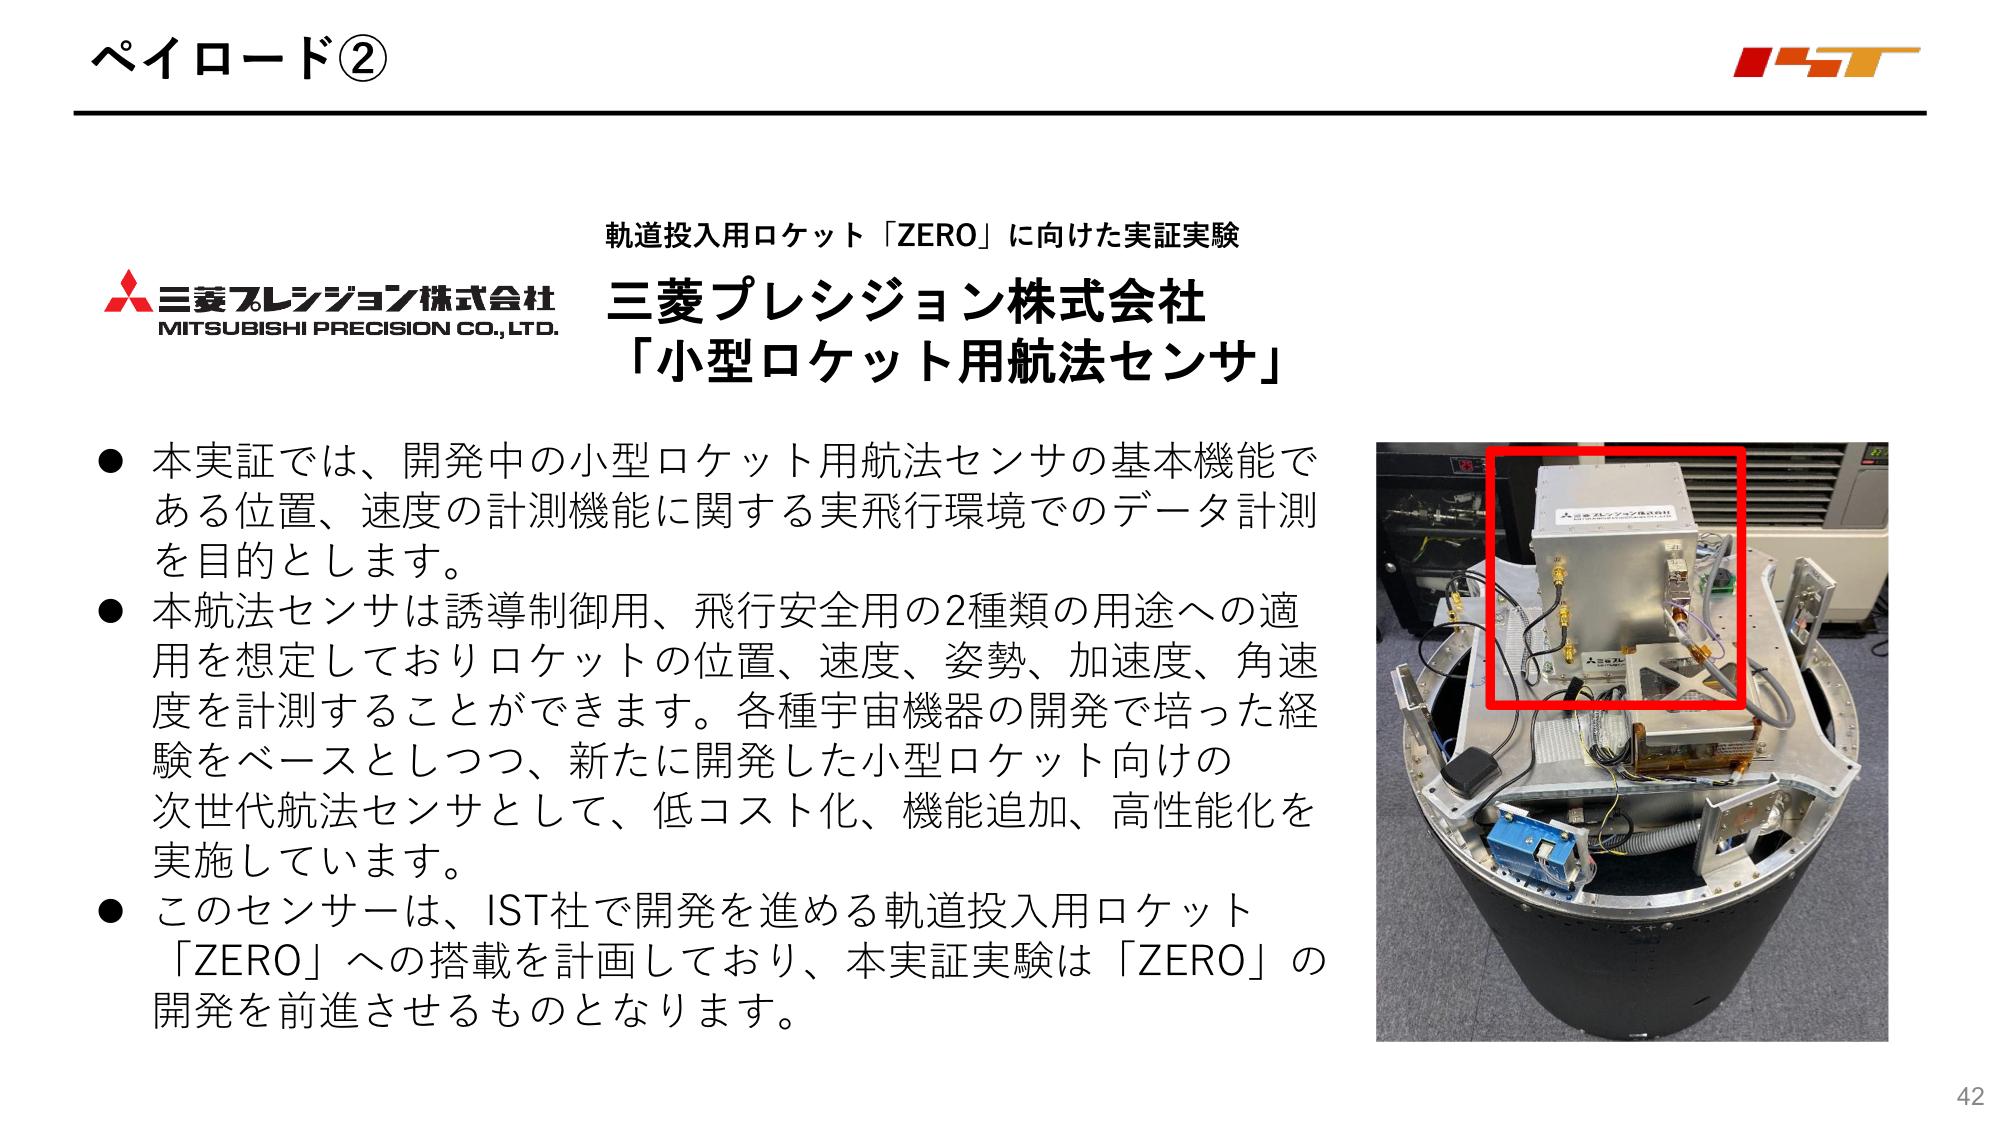 f:id:Imamura:20200603233142p:plain